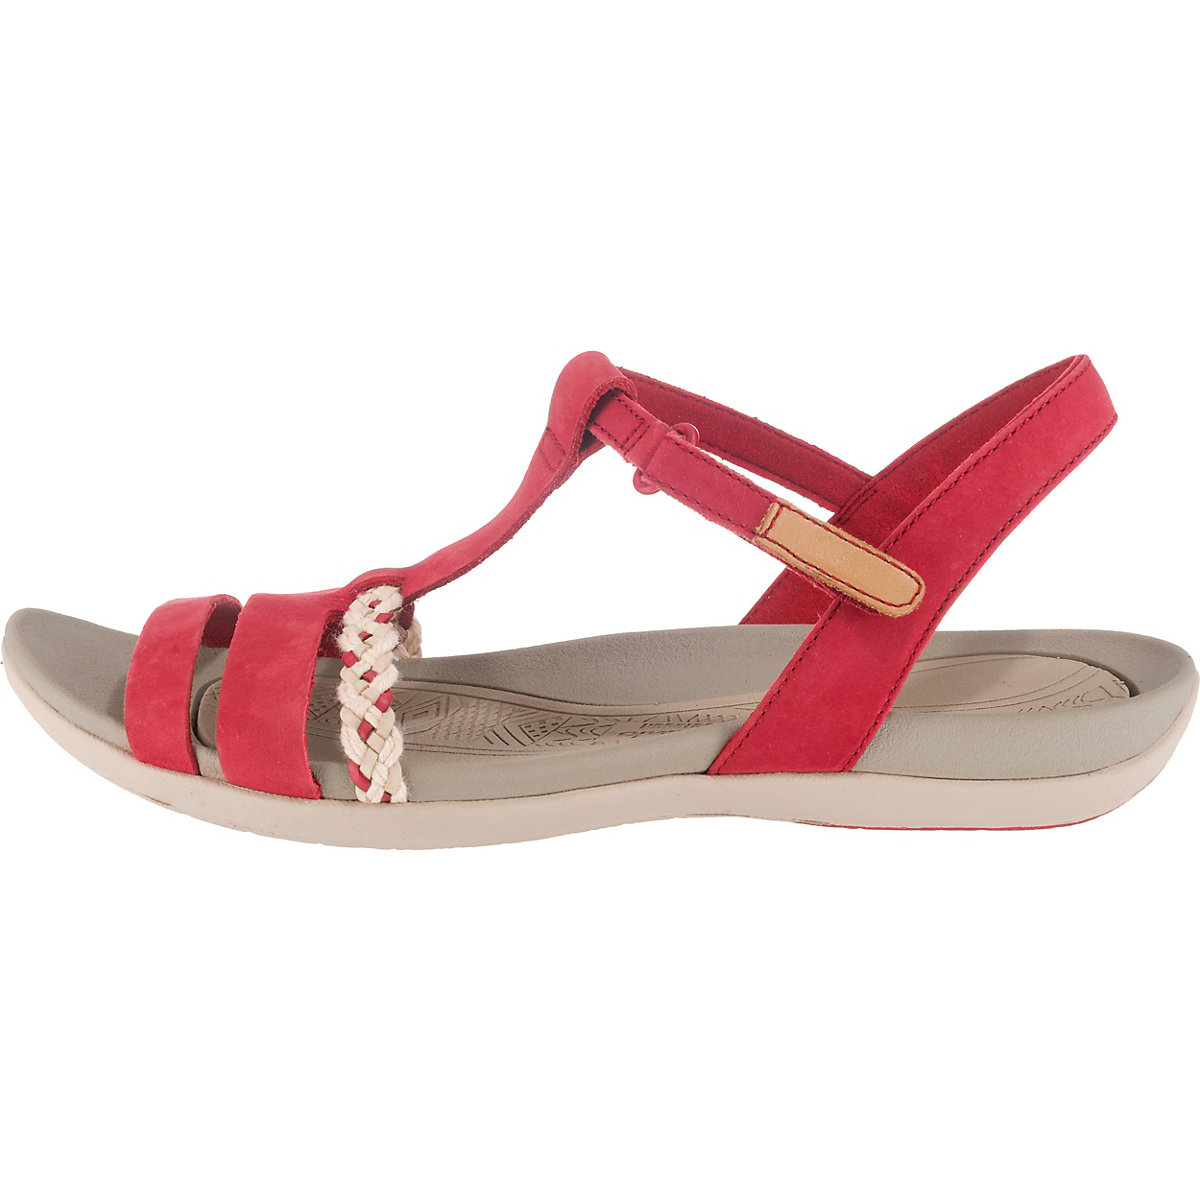 Clarks, Tealite Grace Komfort-Sandalen, rot